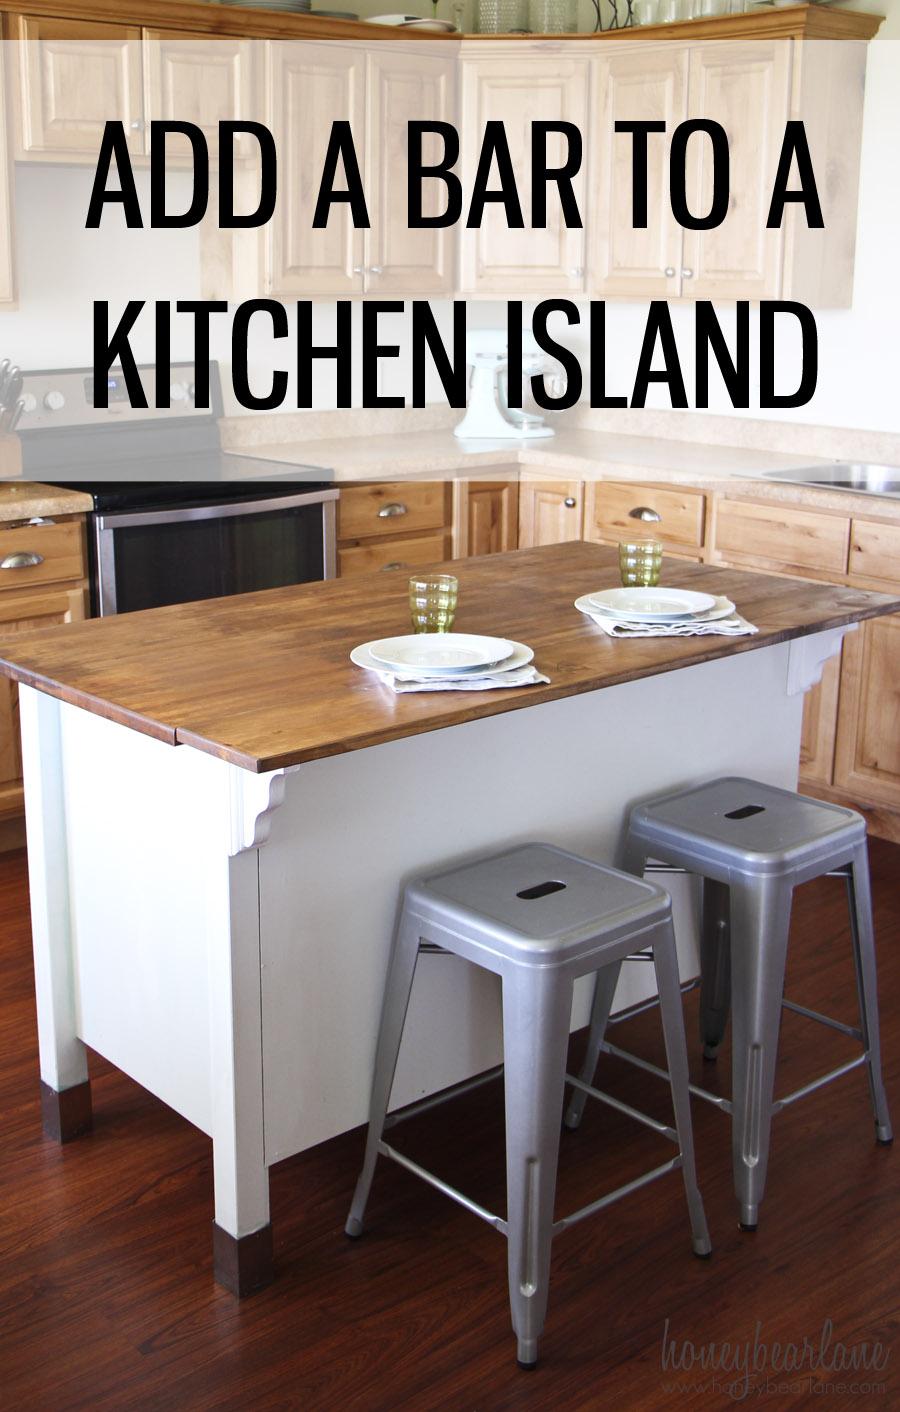 Adding a Bar to a Kitchen Island - Honeybear Lane